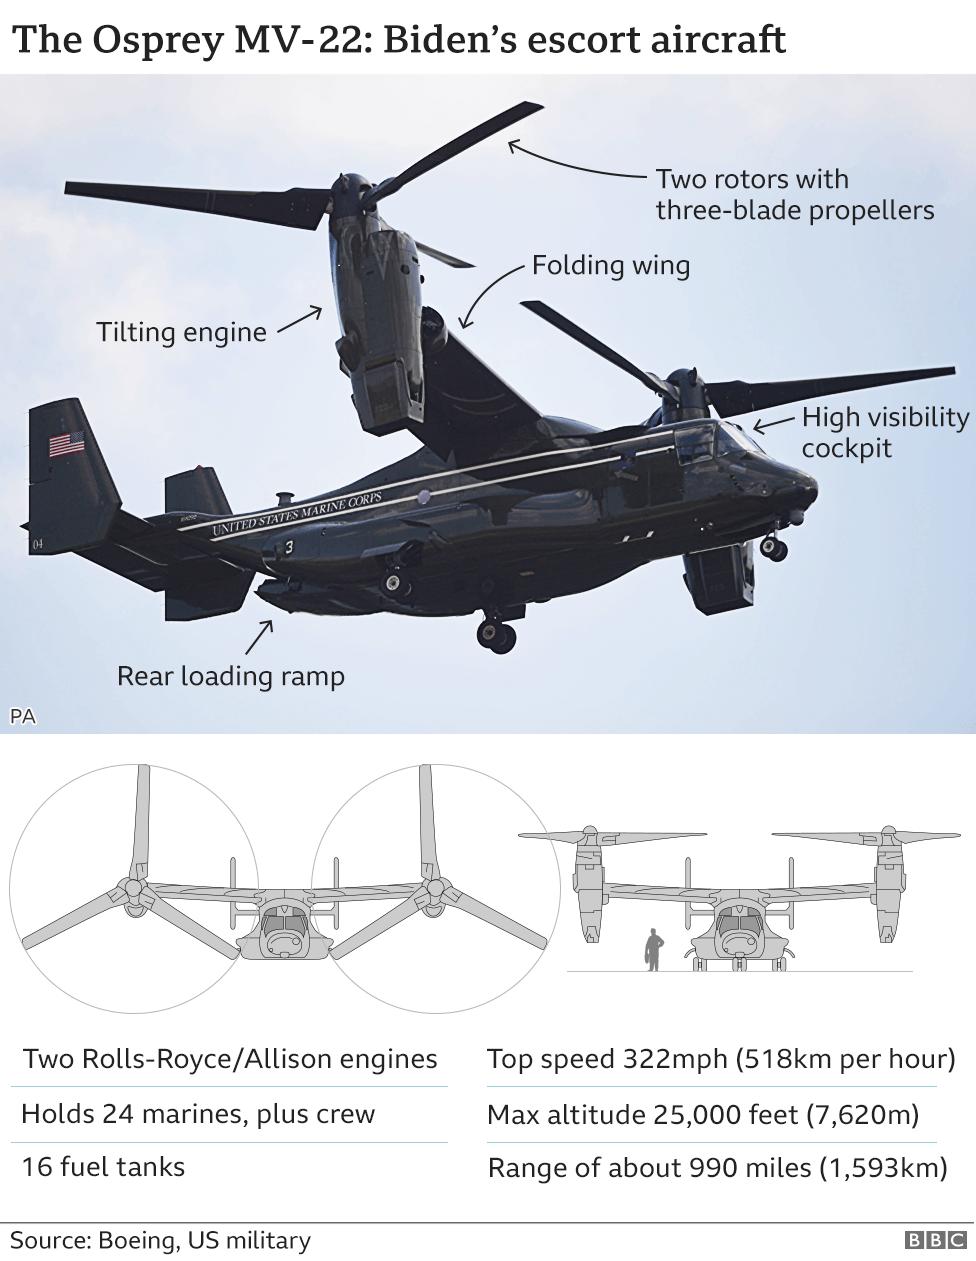 A graphic showing an Osprey MV-22 escort aircraft